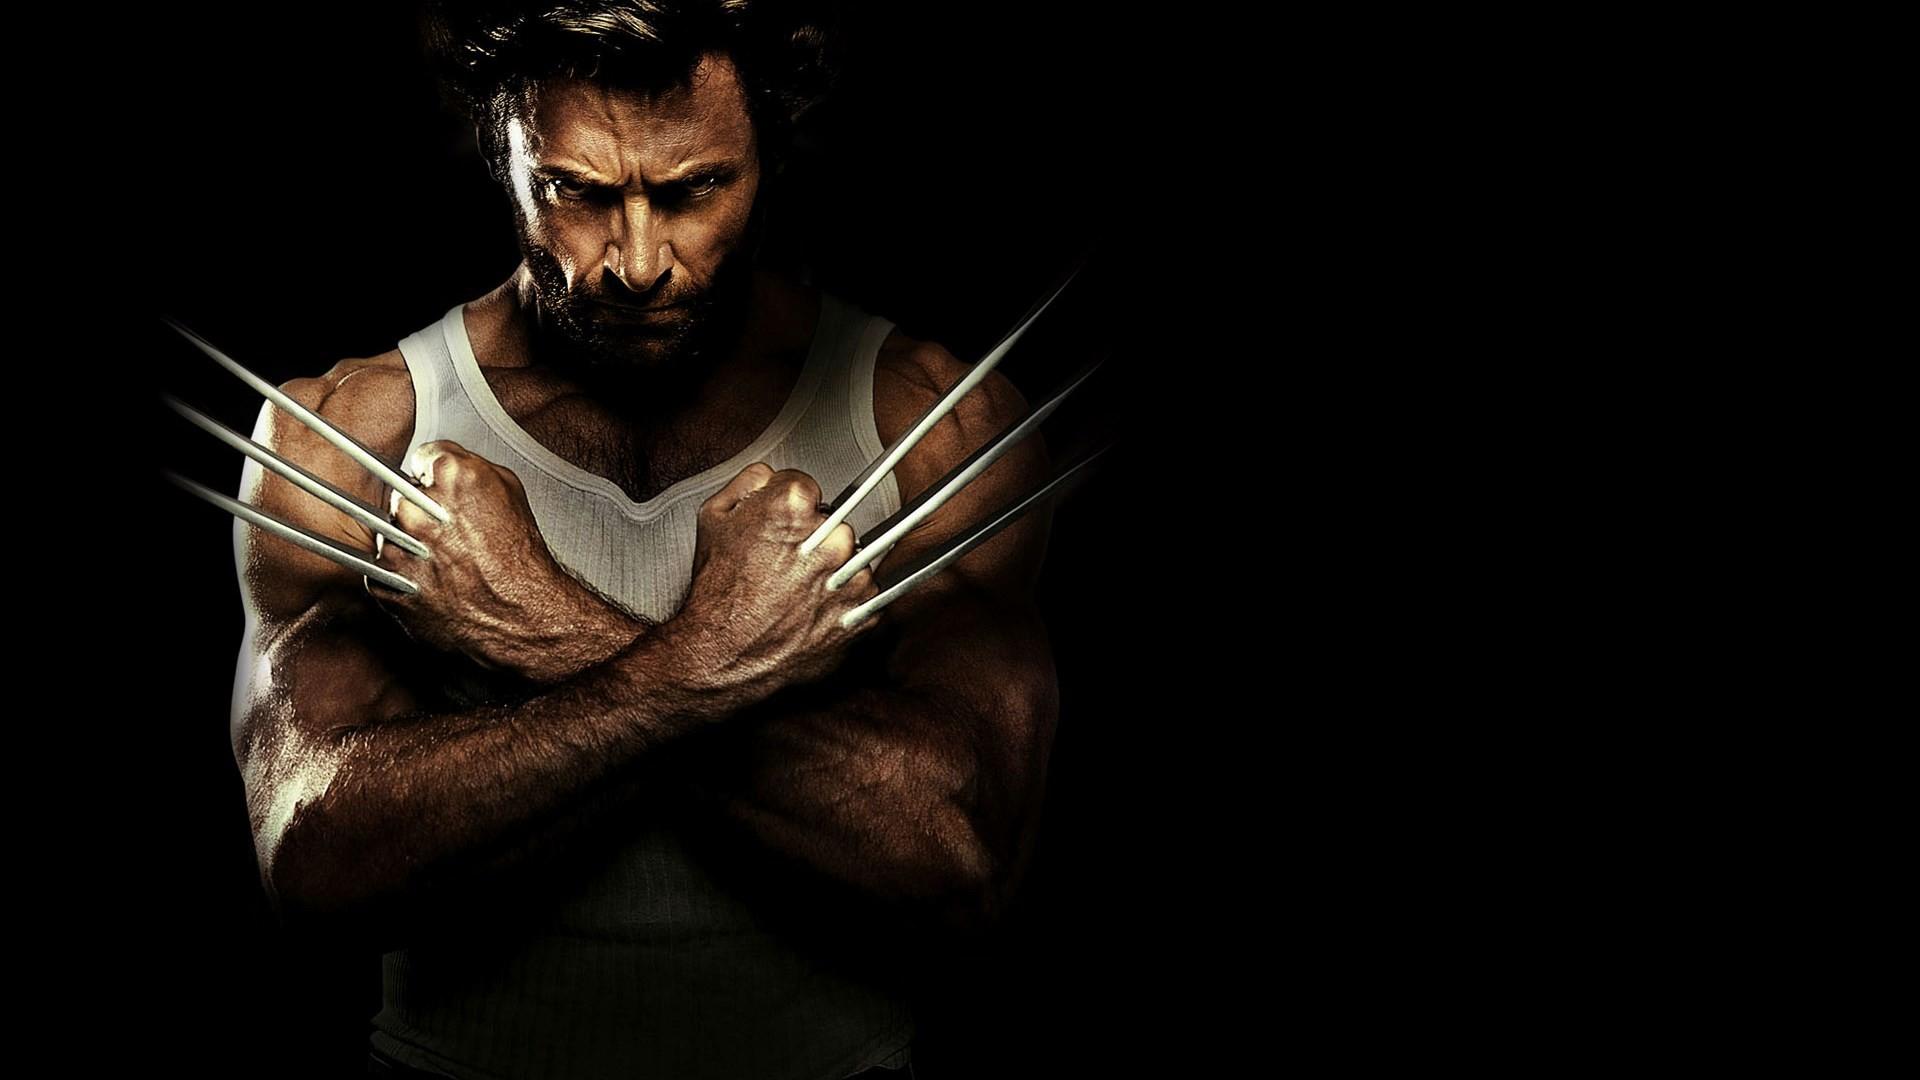 X Men Origins Wolverine Game Wallpaper (63+ images)